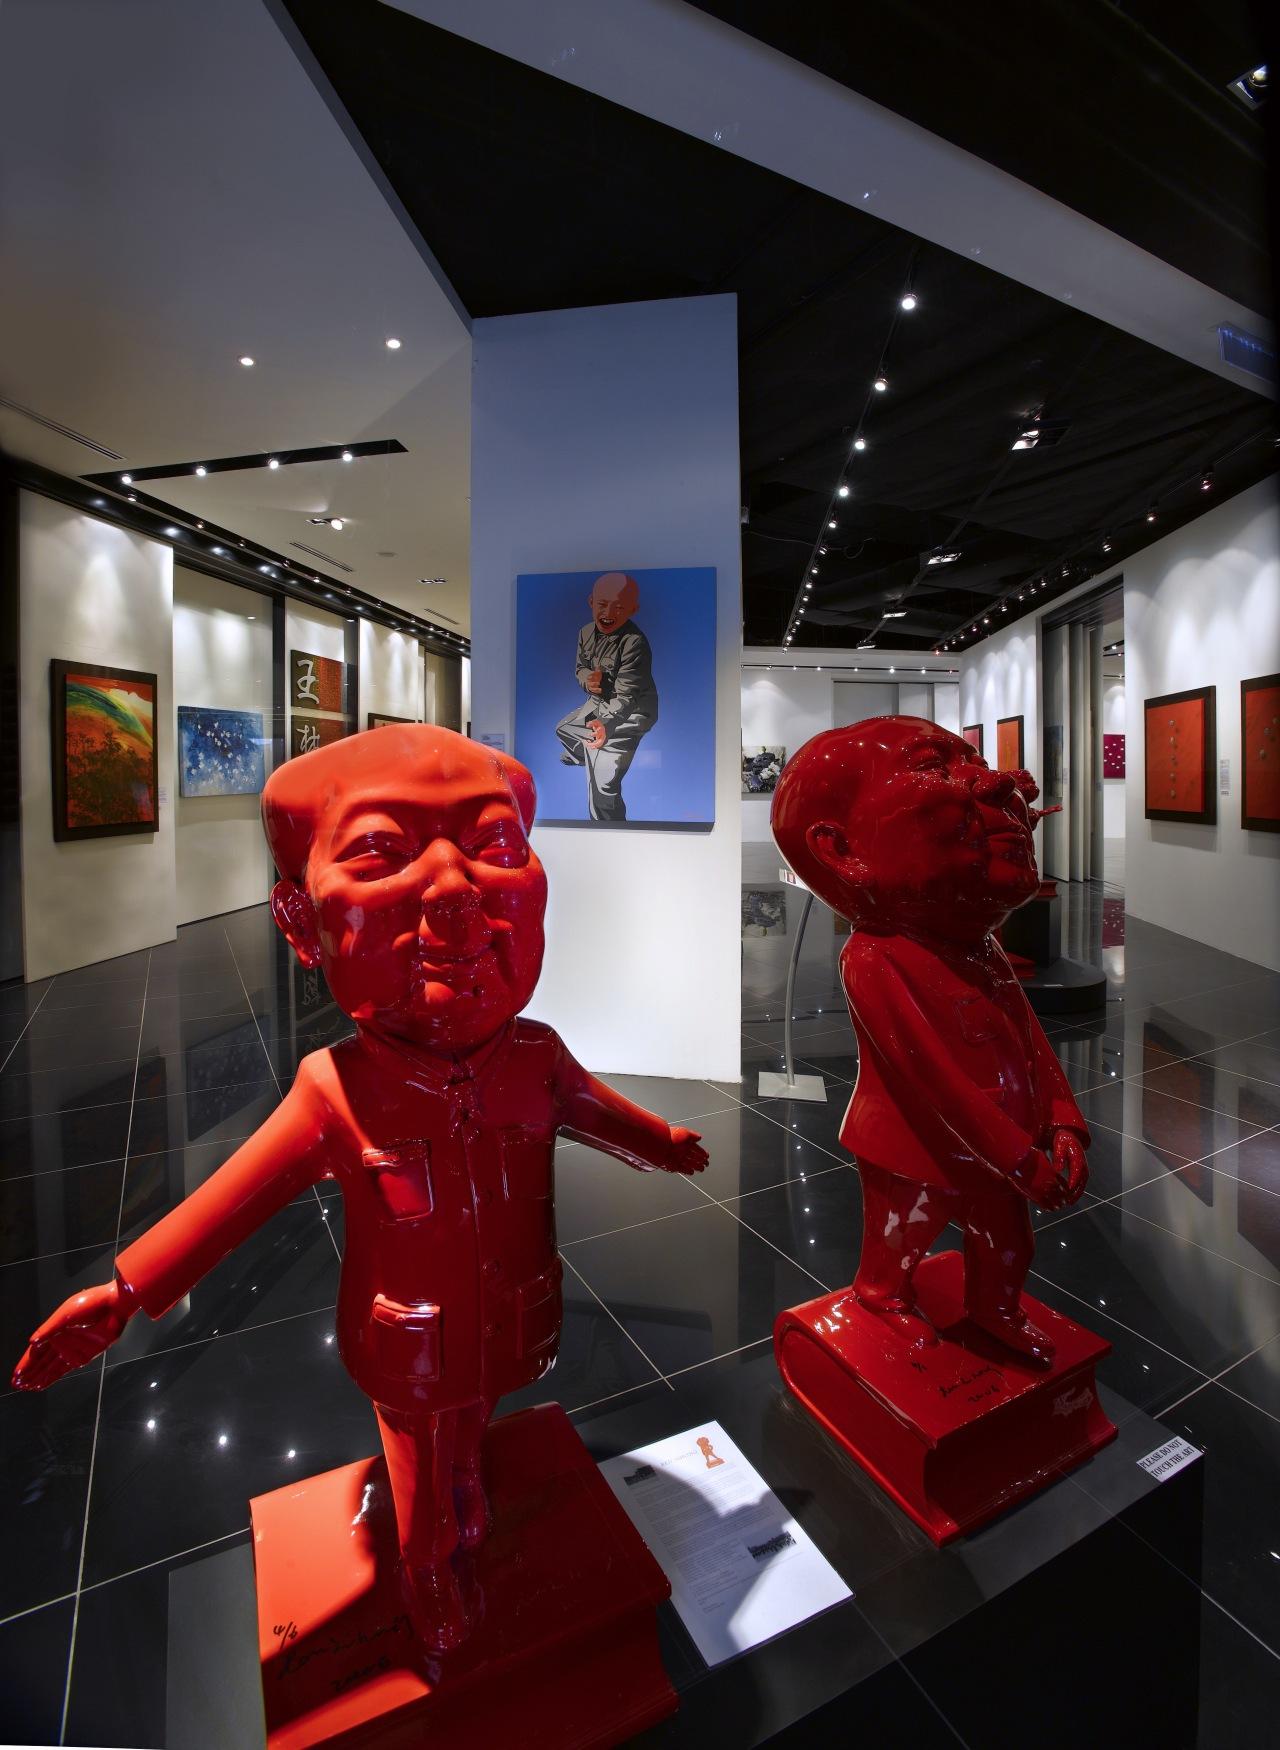 Interior view of the Art Gallery by Designworx, display window, exhibition, interior design, technology, black, red